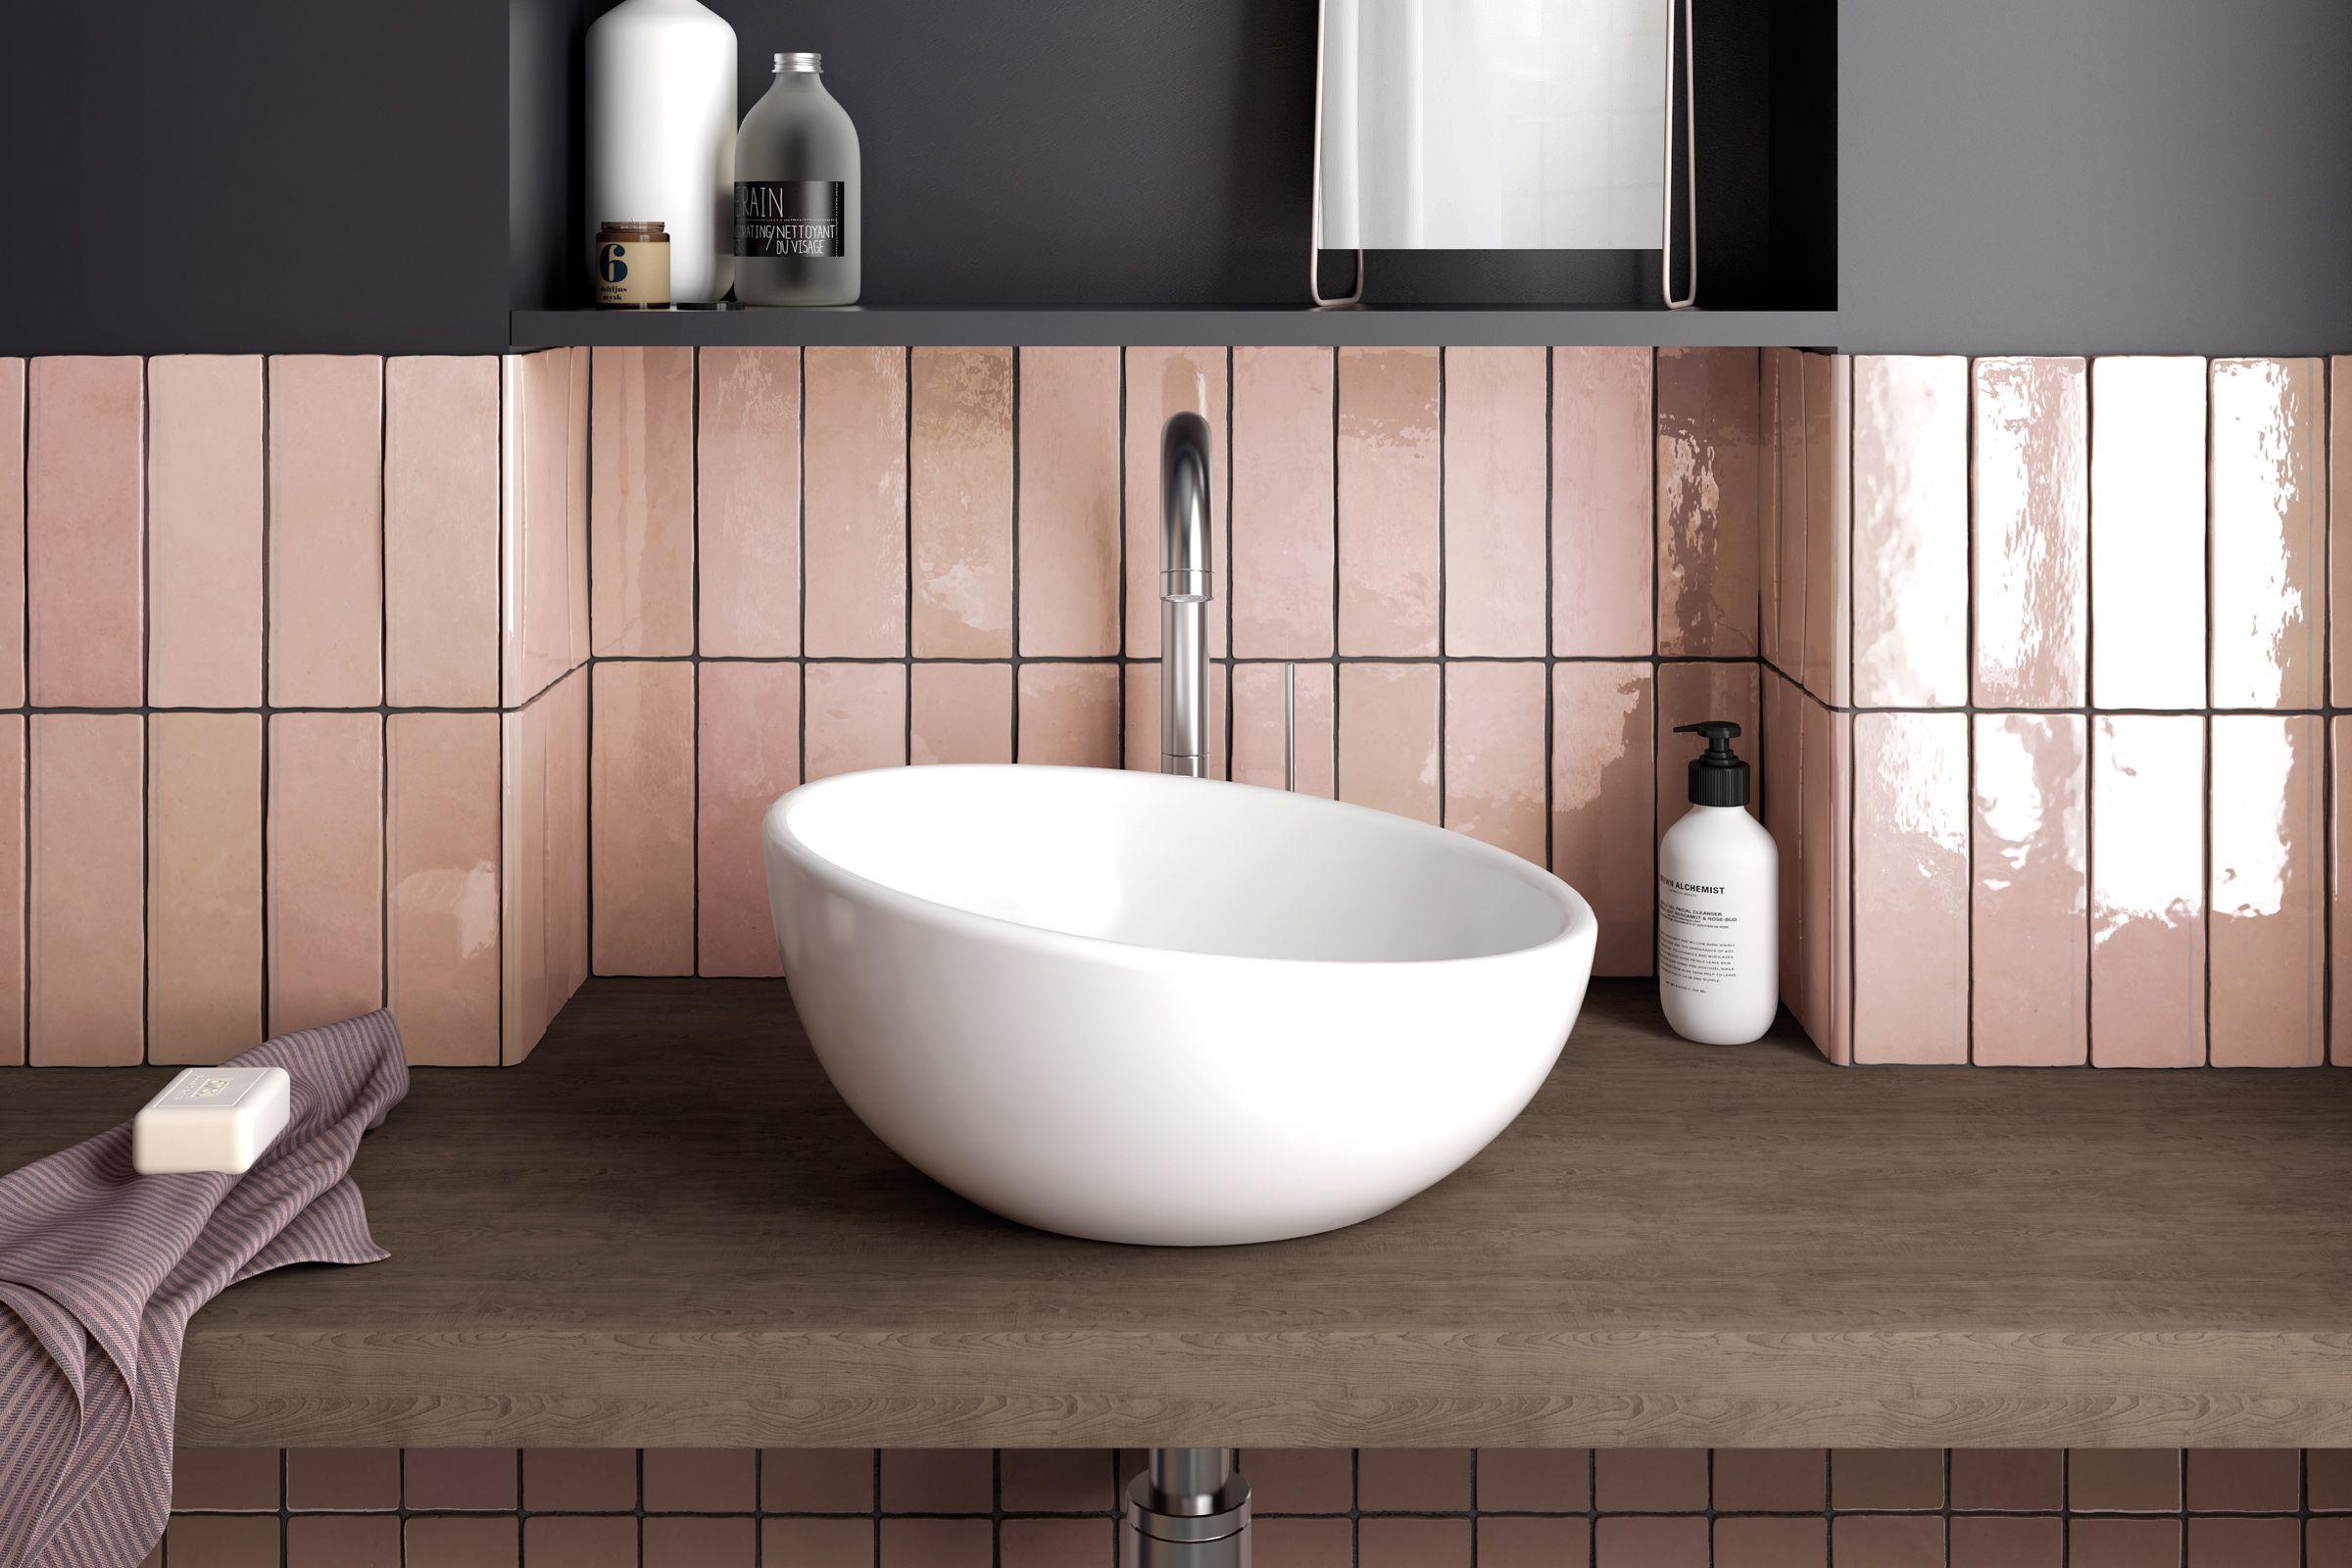 Cloe 2 5 X 8 Glossy Wall Tile In Pink 10 64 Sqft Ctn Walmart Com In 2020 Wall Tiles Bathroom Renovation Cost Colorful Interior Design